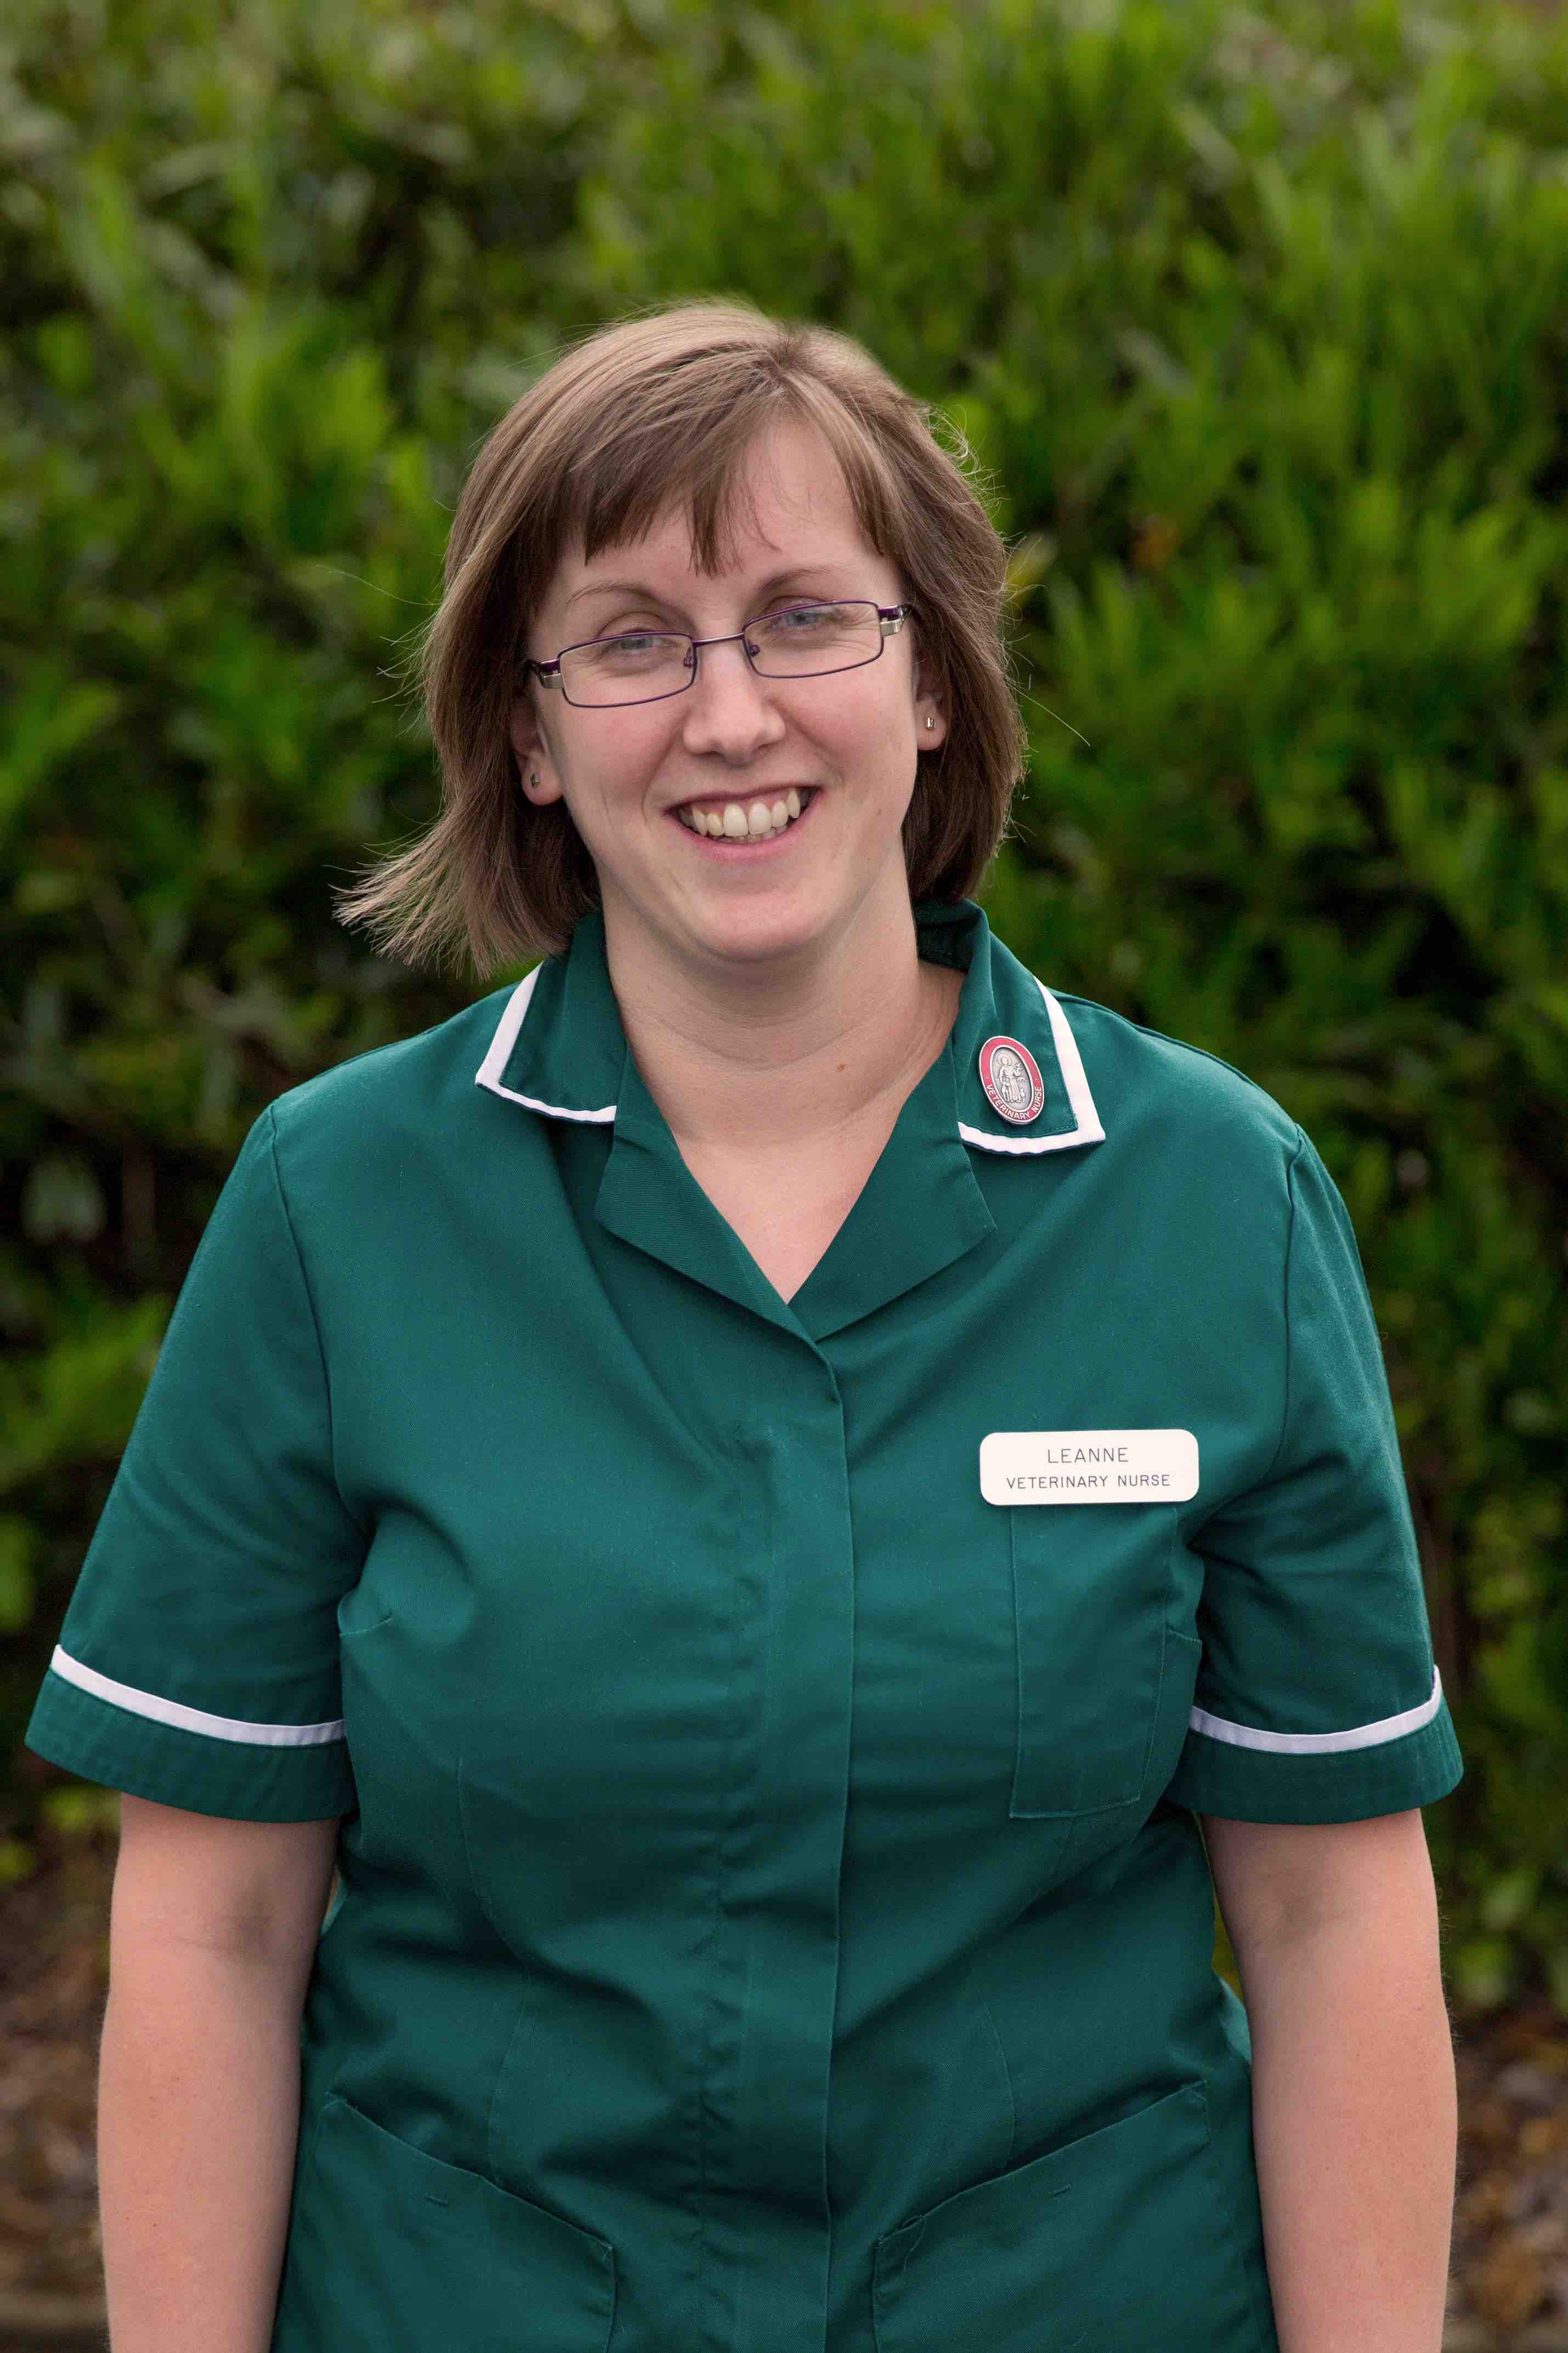 Leanne Morrison nurse